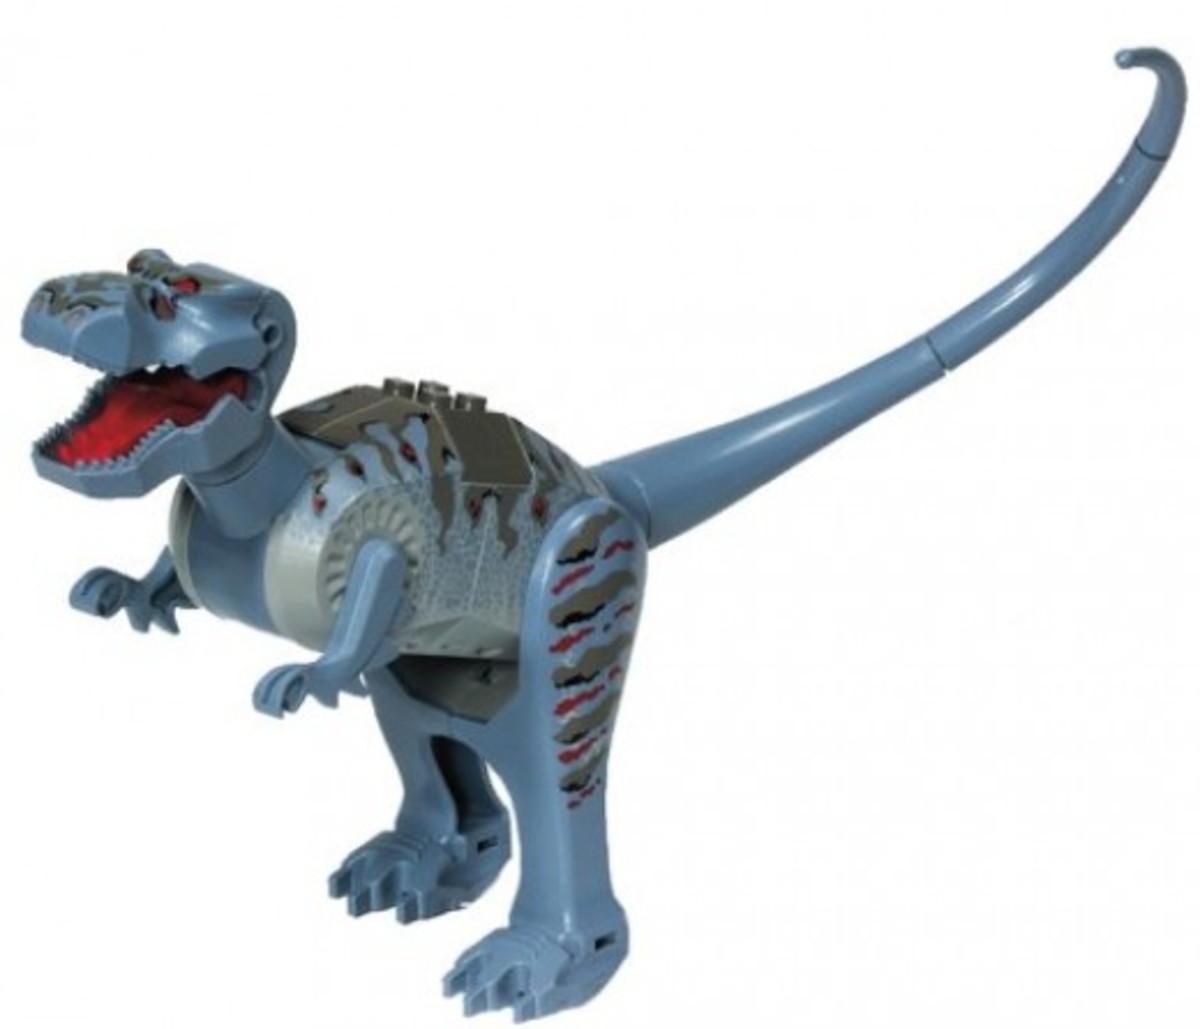 LEGO Dinosaurs Tyrannosaurus Rex 6720 Assembled